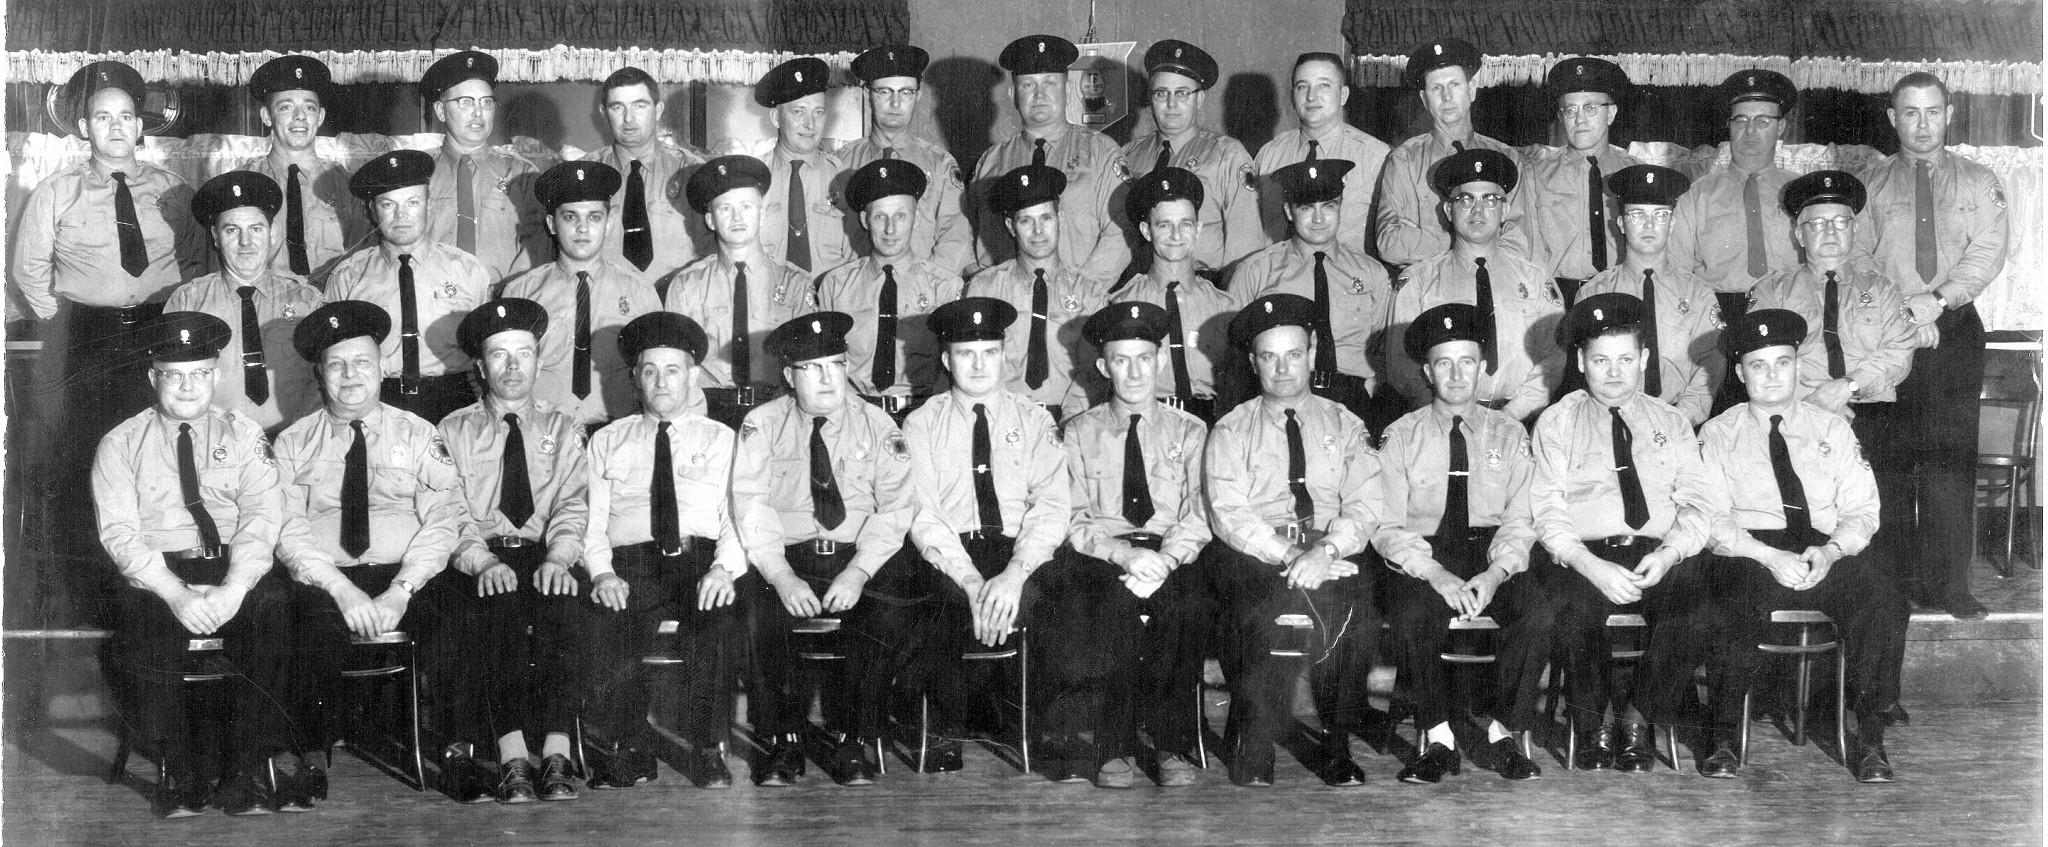 Jerusalem Township firefighters, circa 1950-1957. (Photo courtesy of Fire Chief Tony Parasiliti)